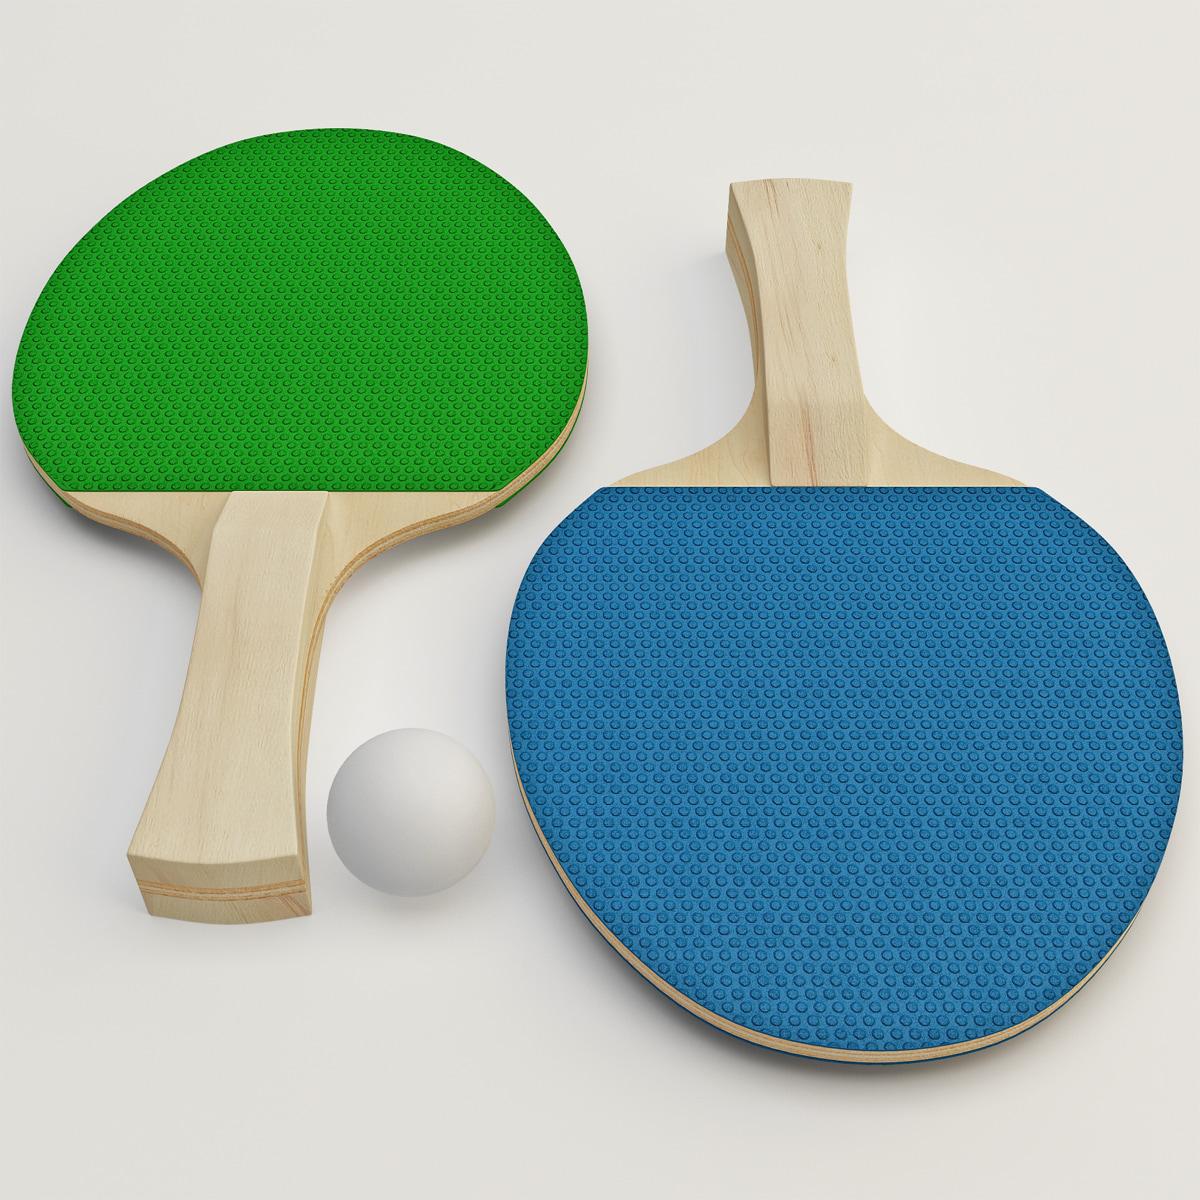 213087_Ping_Pong_Paddles_001.jpg